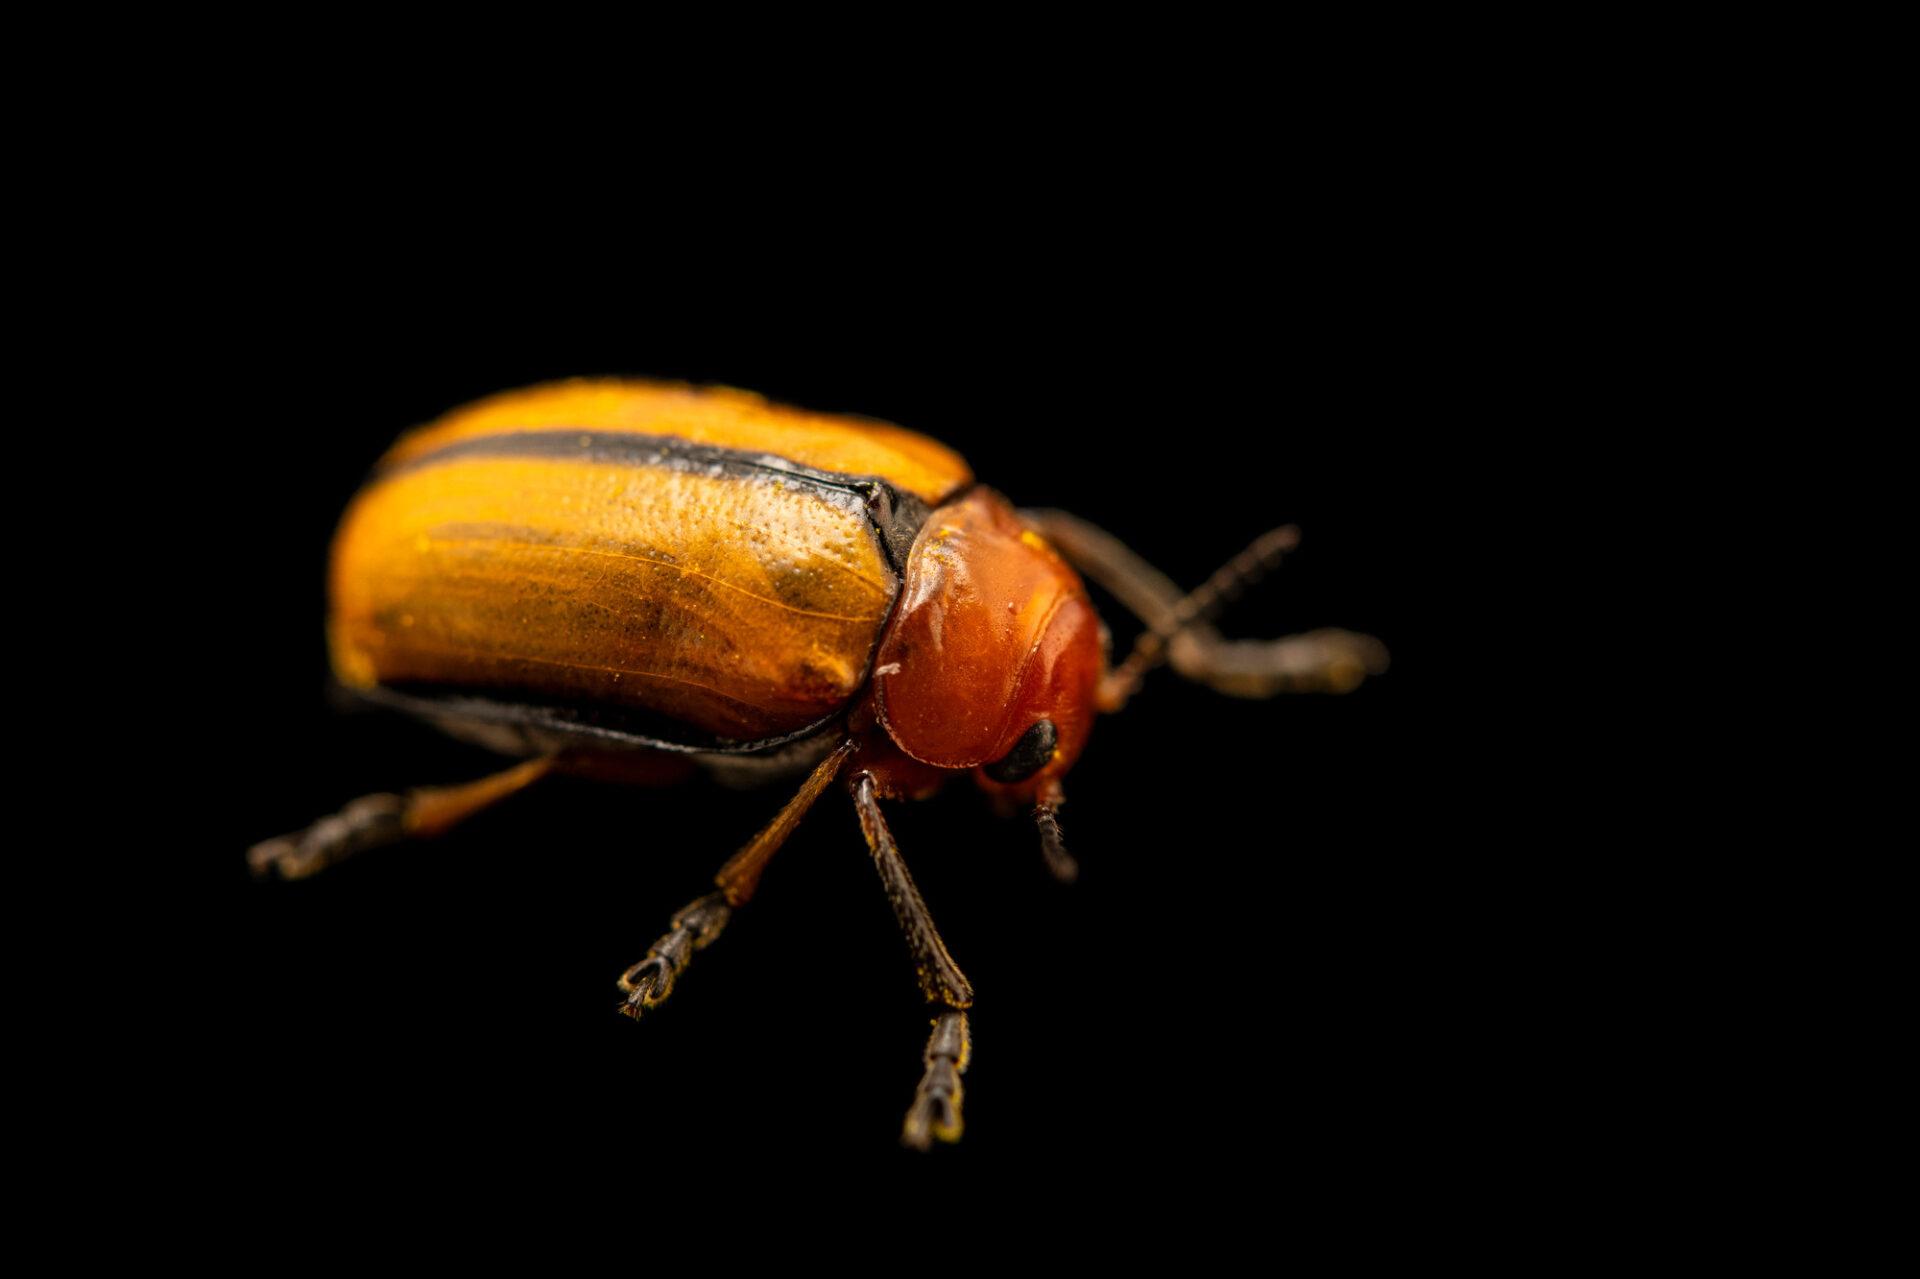 Photo: A clay-colored leaf beetle (Anomoea laticlavia) photographed at Spring Creek Prairie Audubon Center near Denton, NE. This animal was originally collected from Bobcat Prairie near Denton, NE.